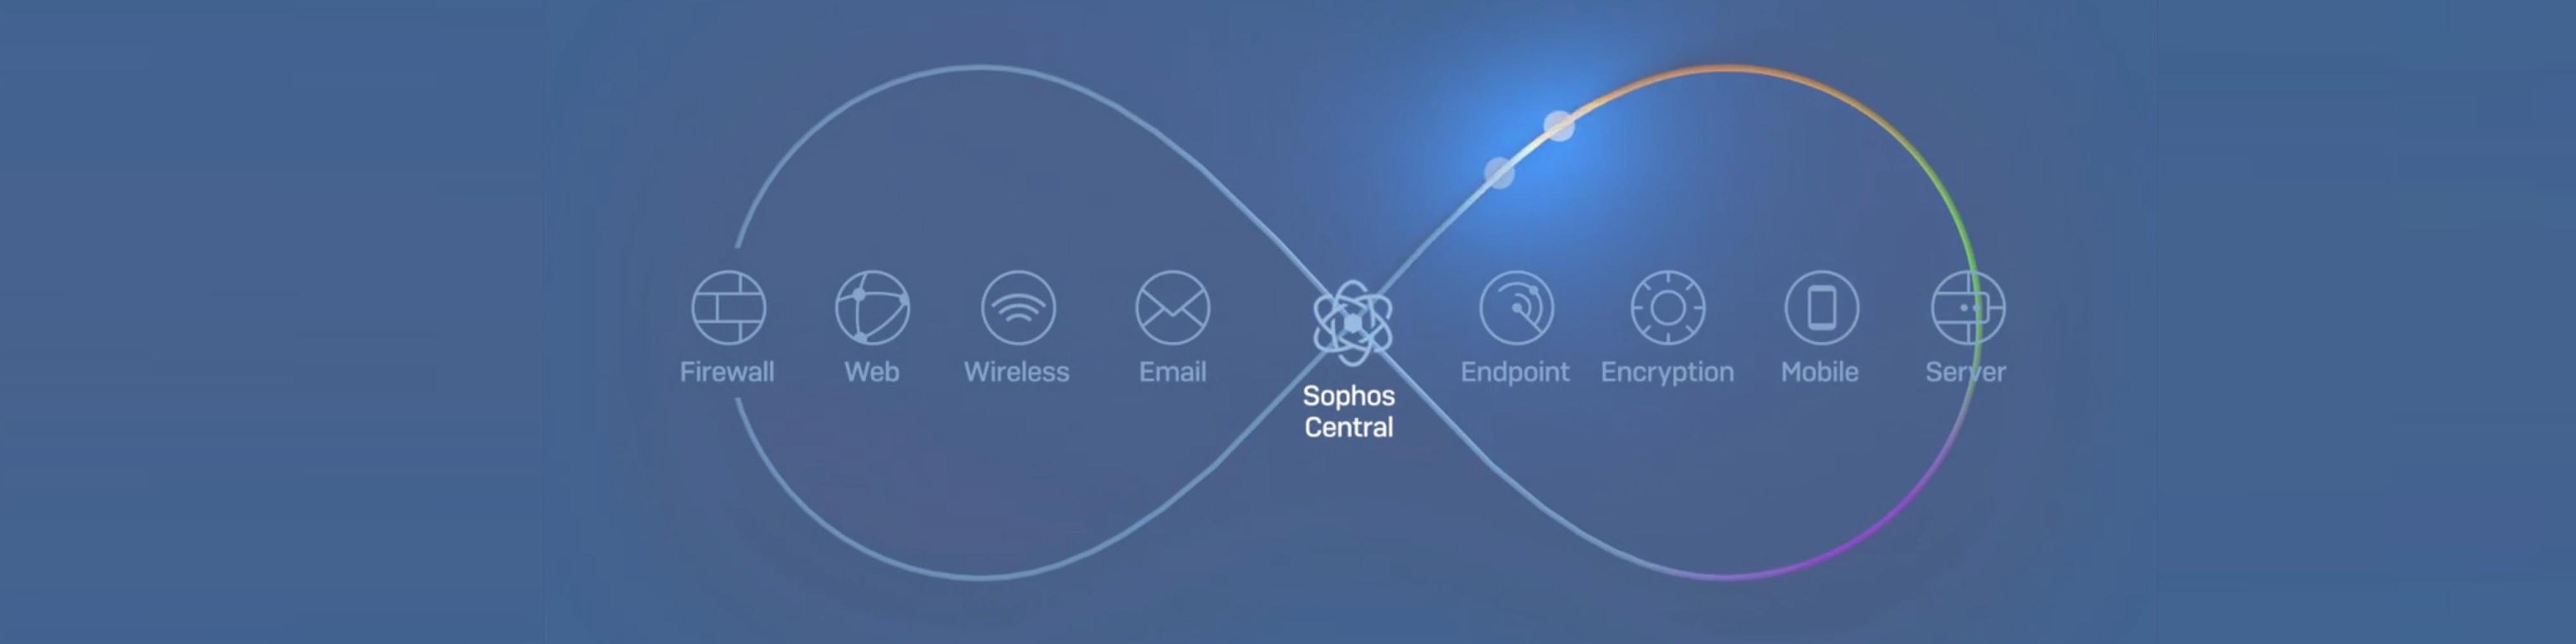 Sophos SliderElement